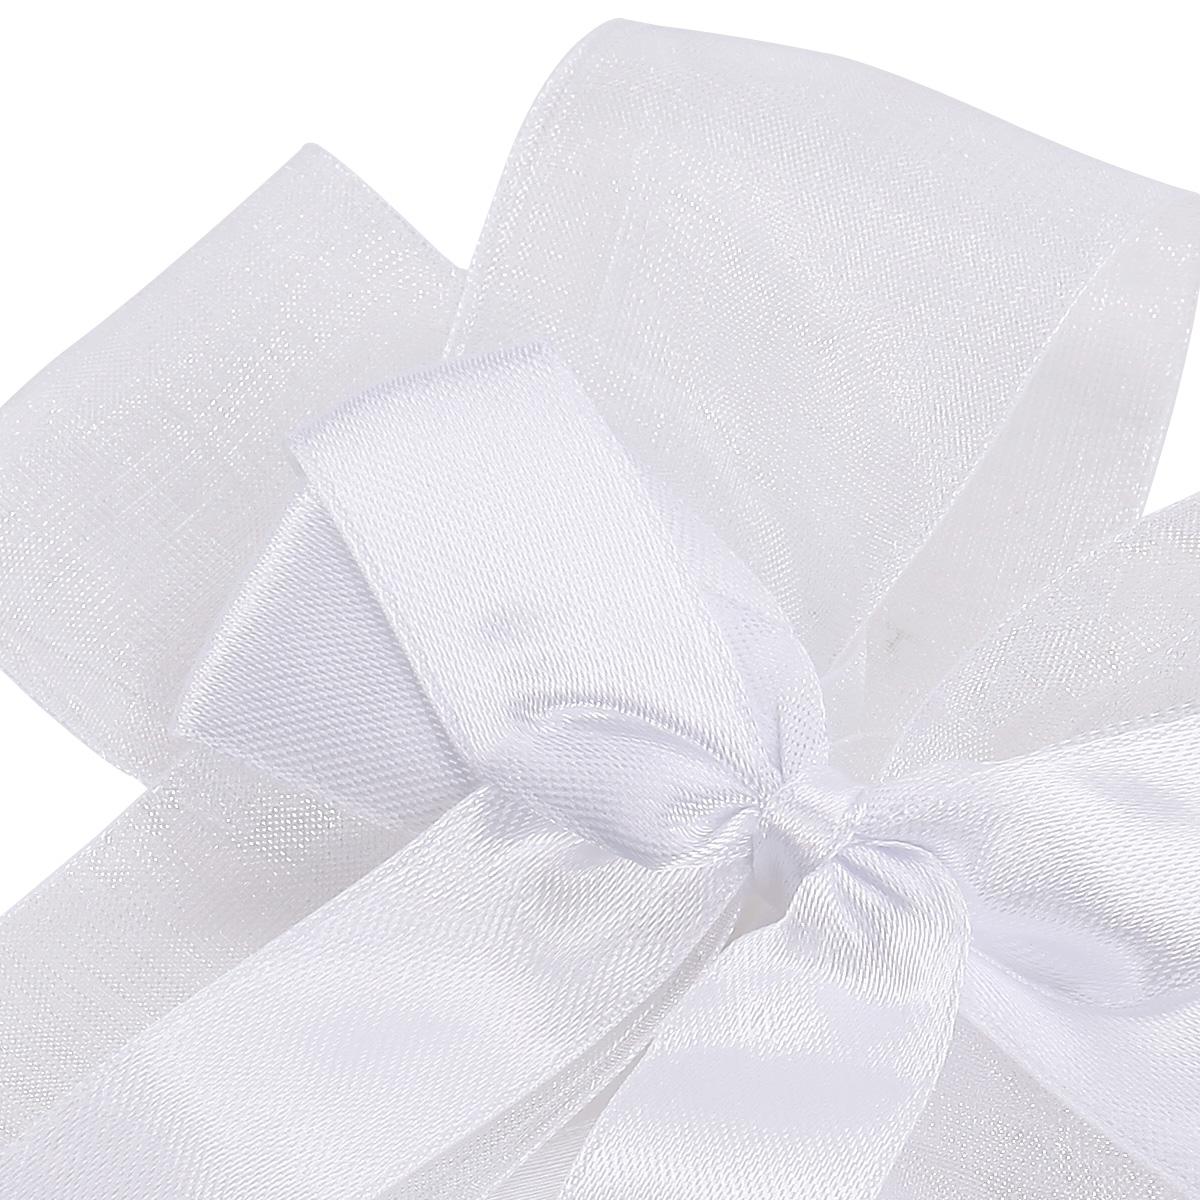 10x noeud papillon ruban satin ruban tulle pr mariage voiture d coration 057 ebay. Black Bedroom Furniture Sets. Home Design Ideas